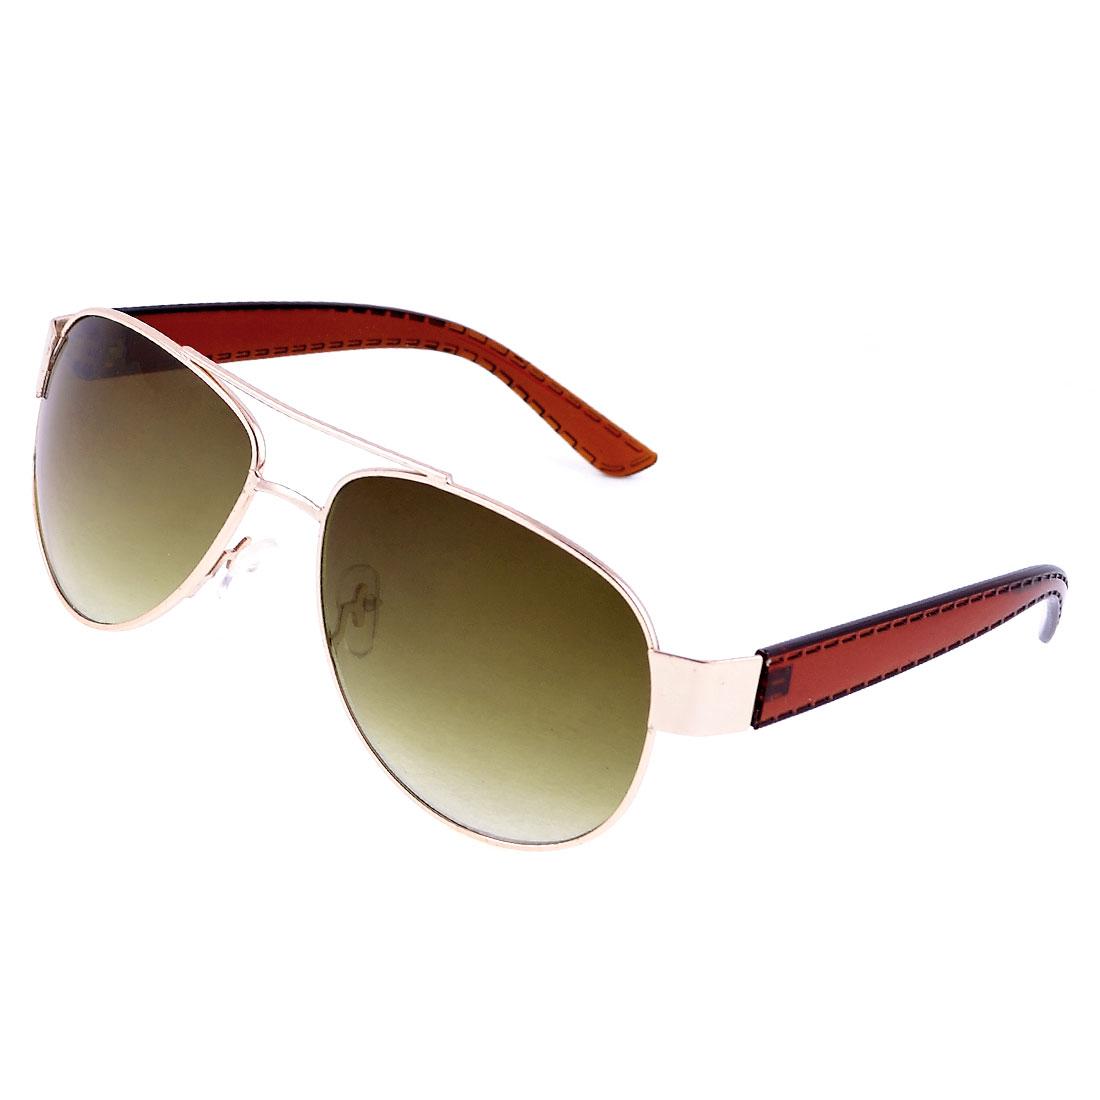 Man Leisure Metal Rim Brown Lens Plastic Arms Eyes Protective Sunglasses